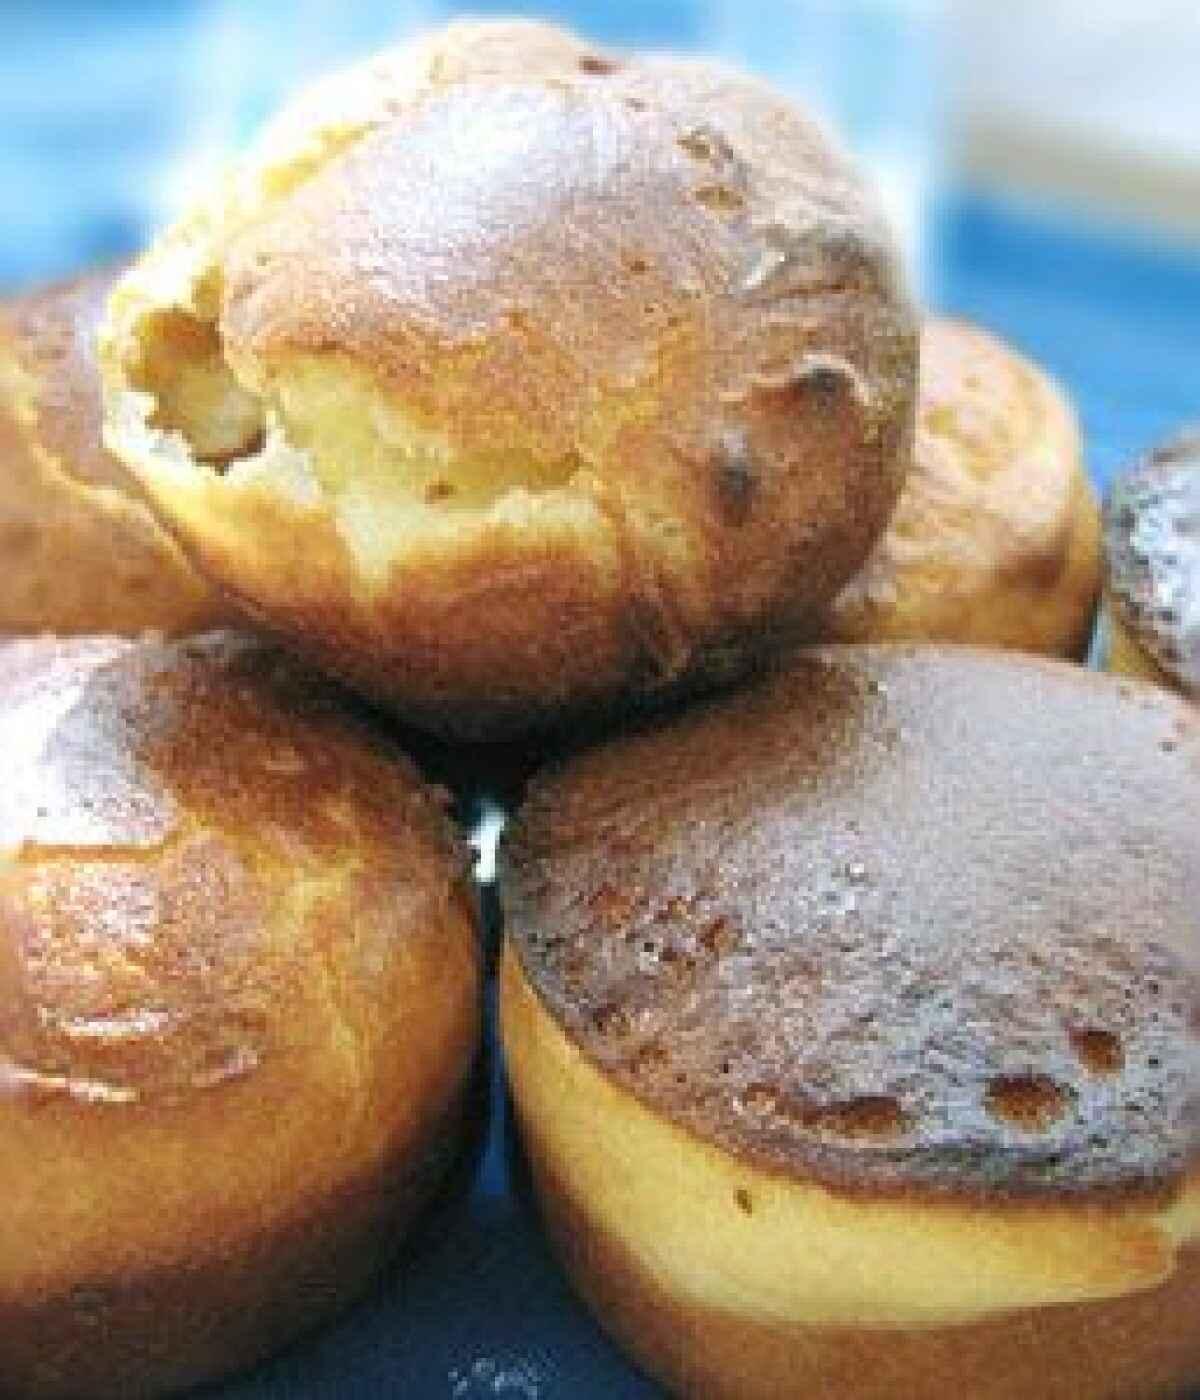 Yorkshire Pudding Ricetta Bimby.Yorkshire Pudding Buttalapasta